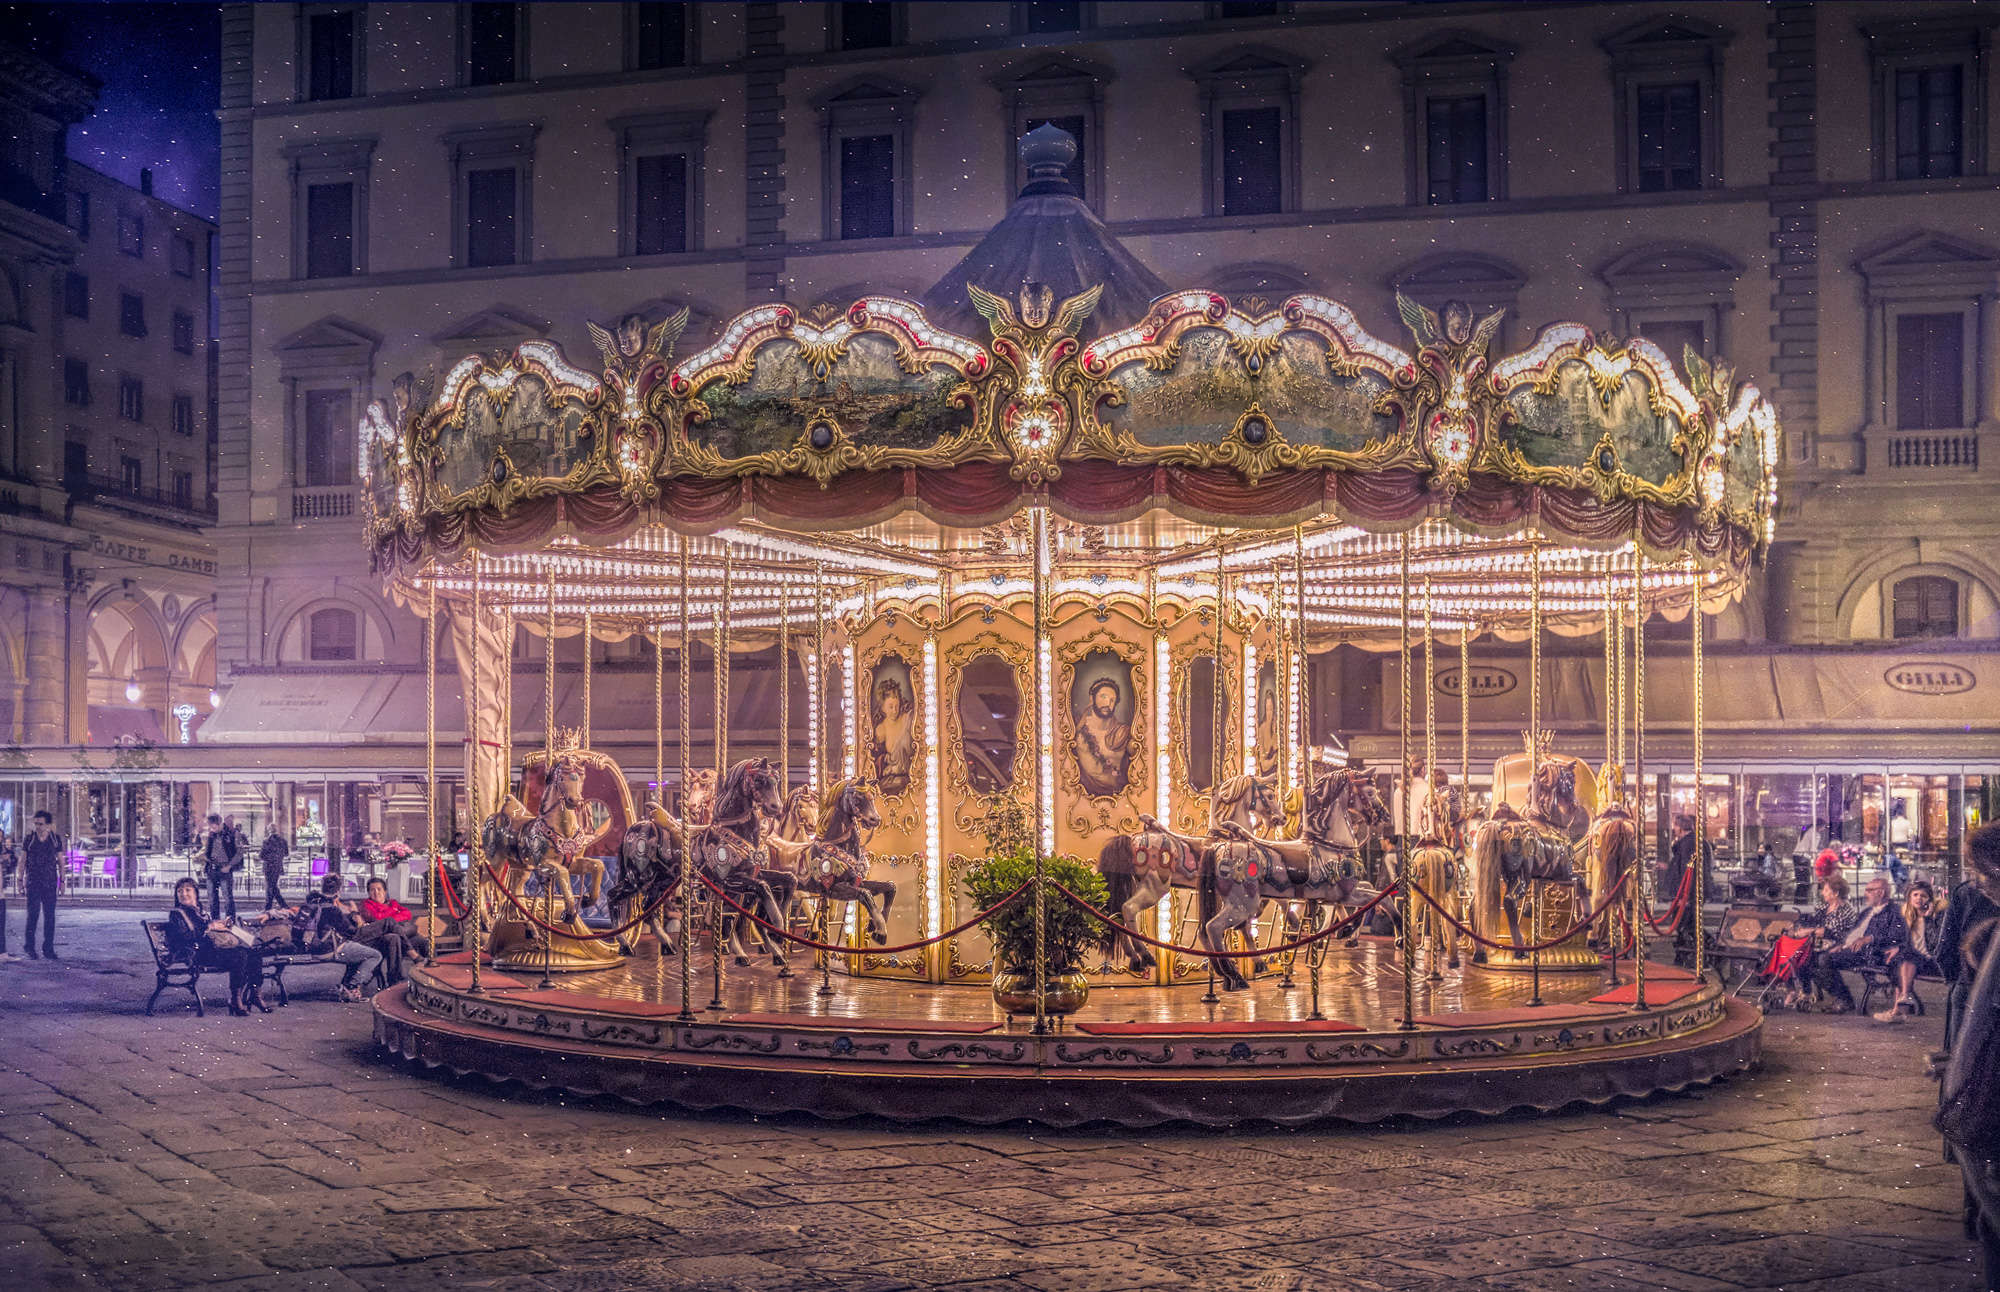 Christian Marcel - Florence Christmas Carousel